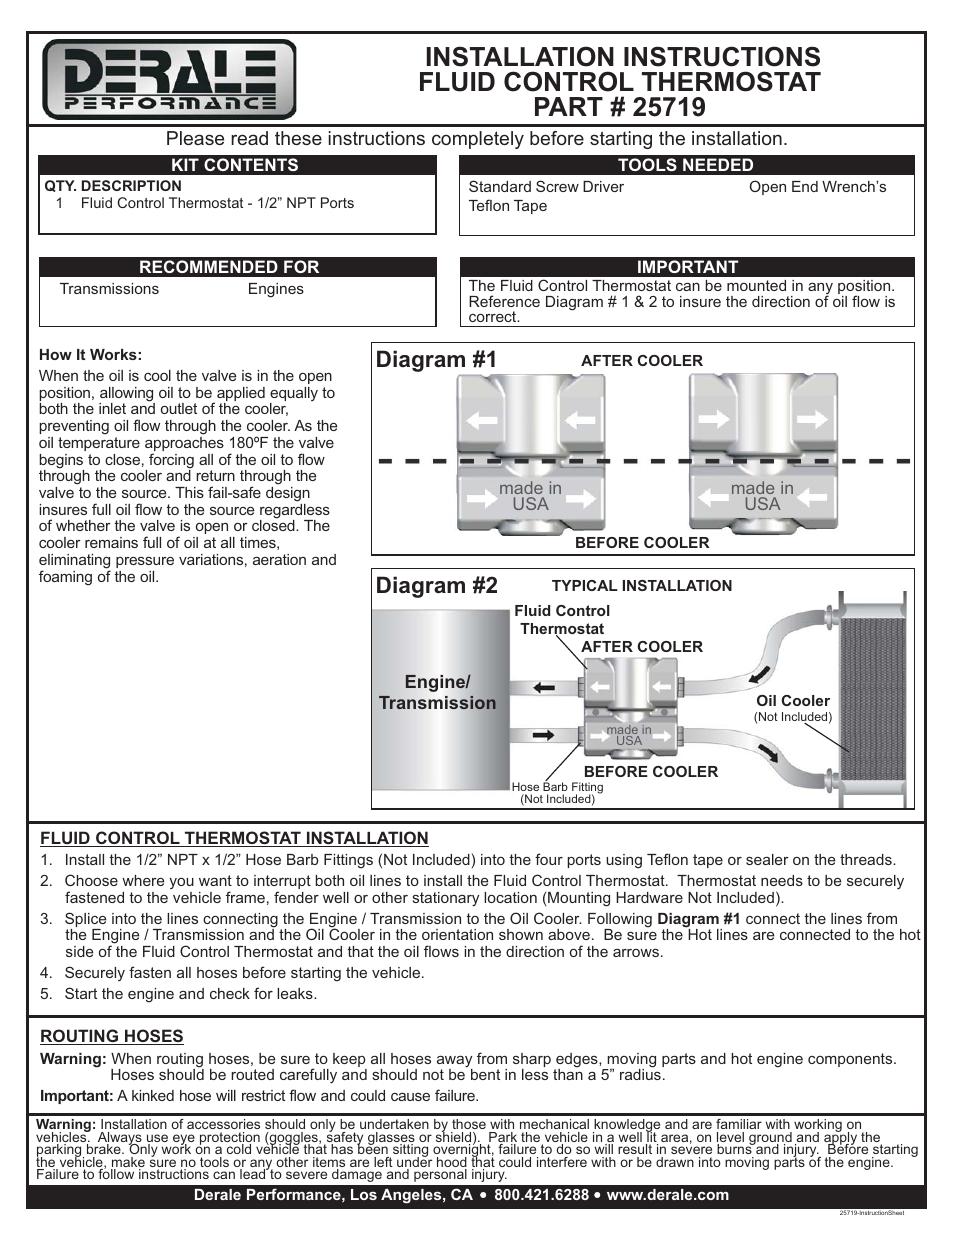 [ZHKZ_3066]  Derale 25719 Fluid Control Thermostat Kit formtech-inc.com | Derale Oil Cooler Wiring Diagram |  | Formtech